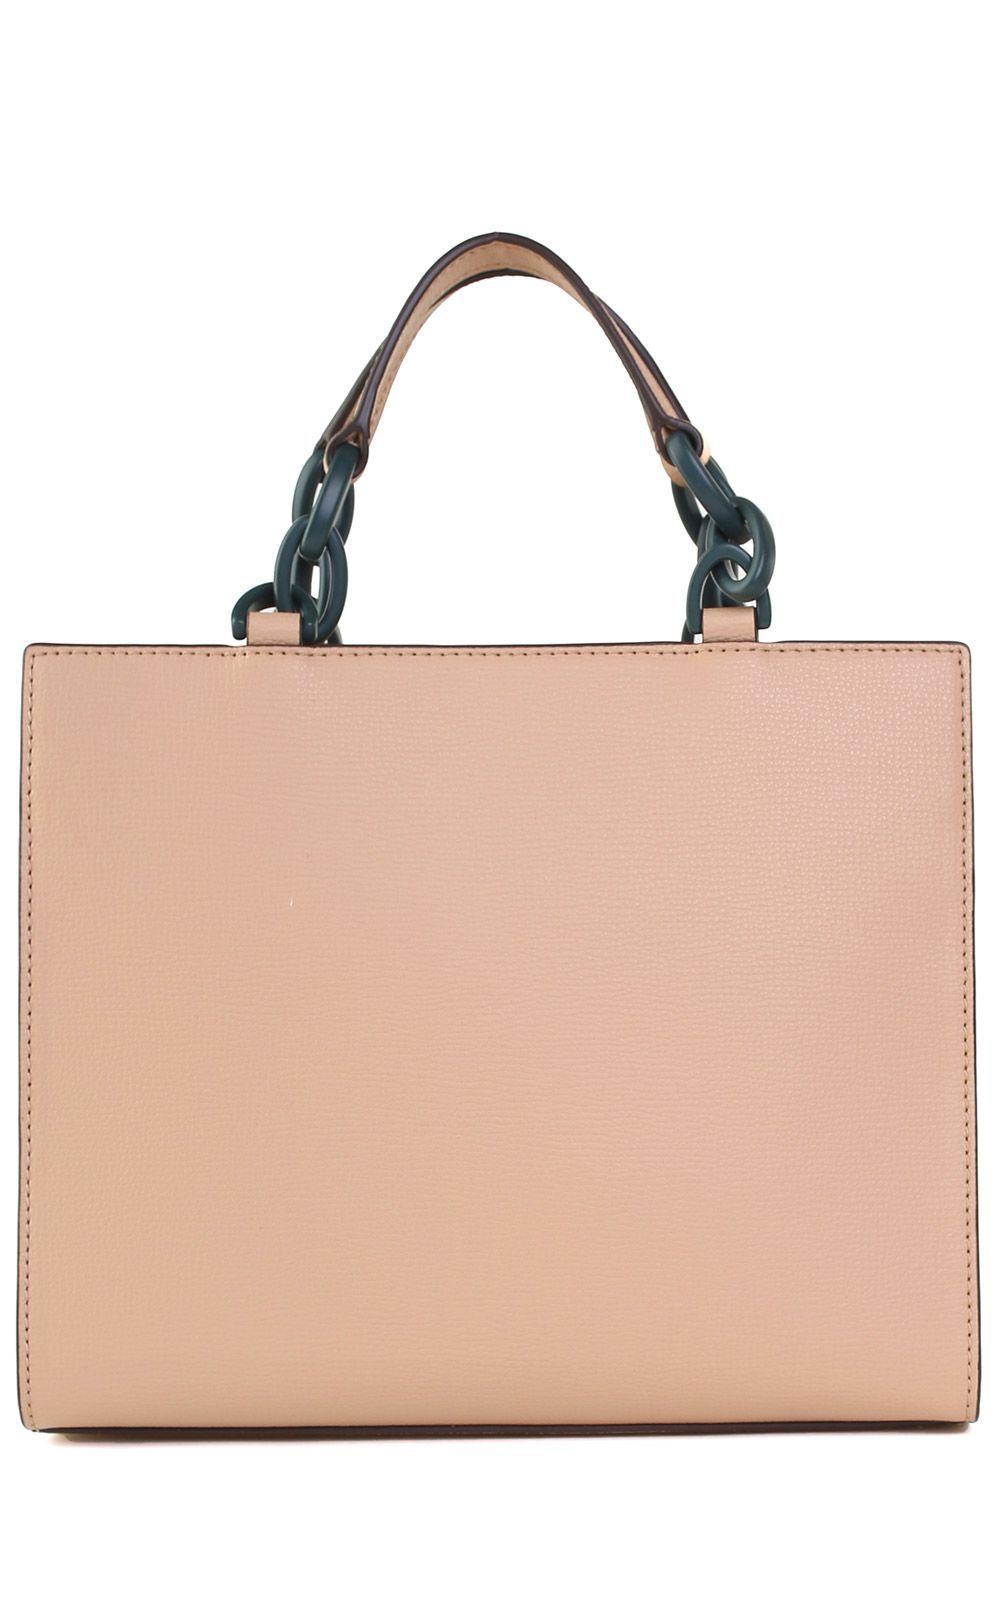 86d256b79dc Tory Burch Kira Small Pebbled-leather Shoulder Bag  leathershoulderbag